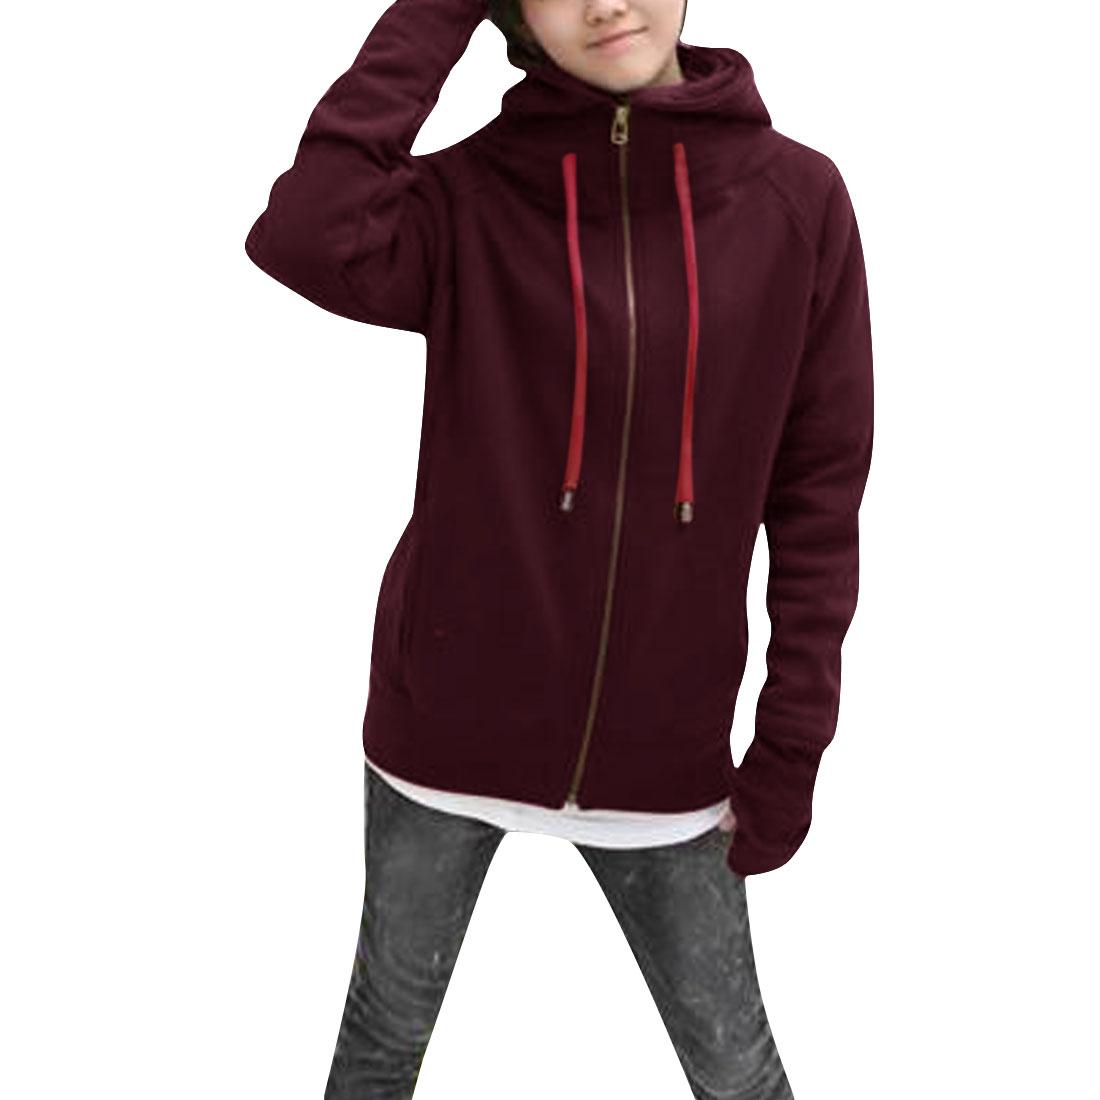 Ladies Chic Thumb Hole Long Sleeve Full Zip-Up Front Burgundy Hoodie S